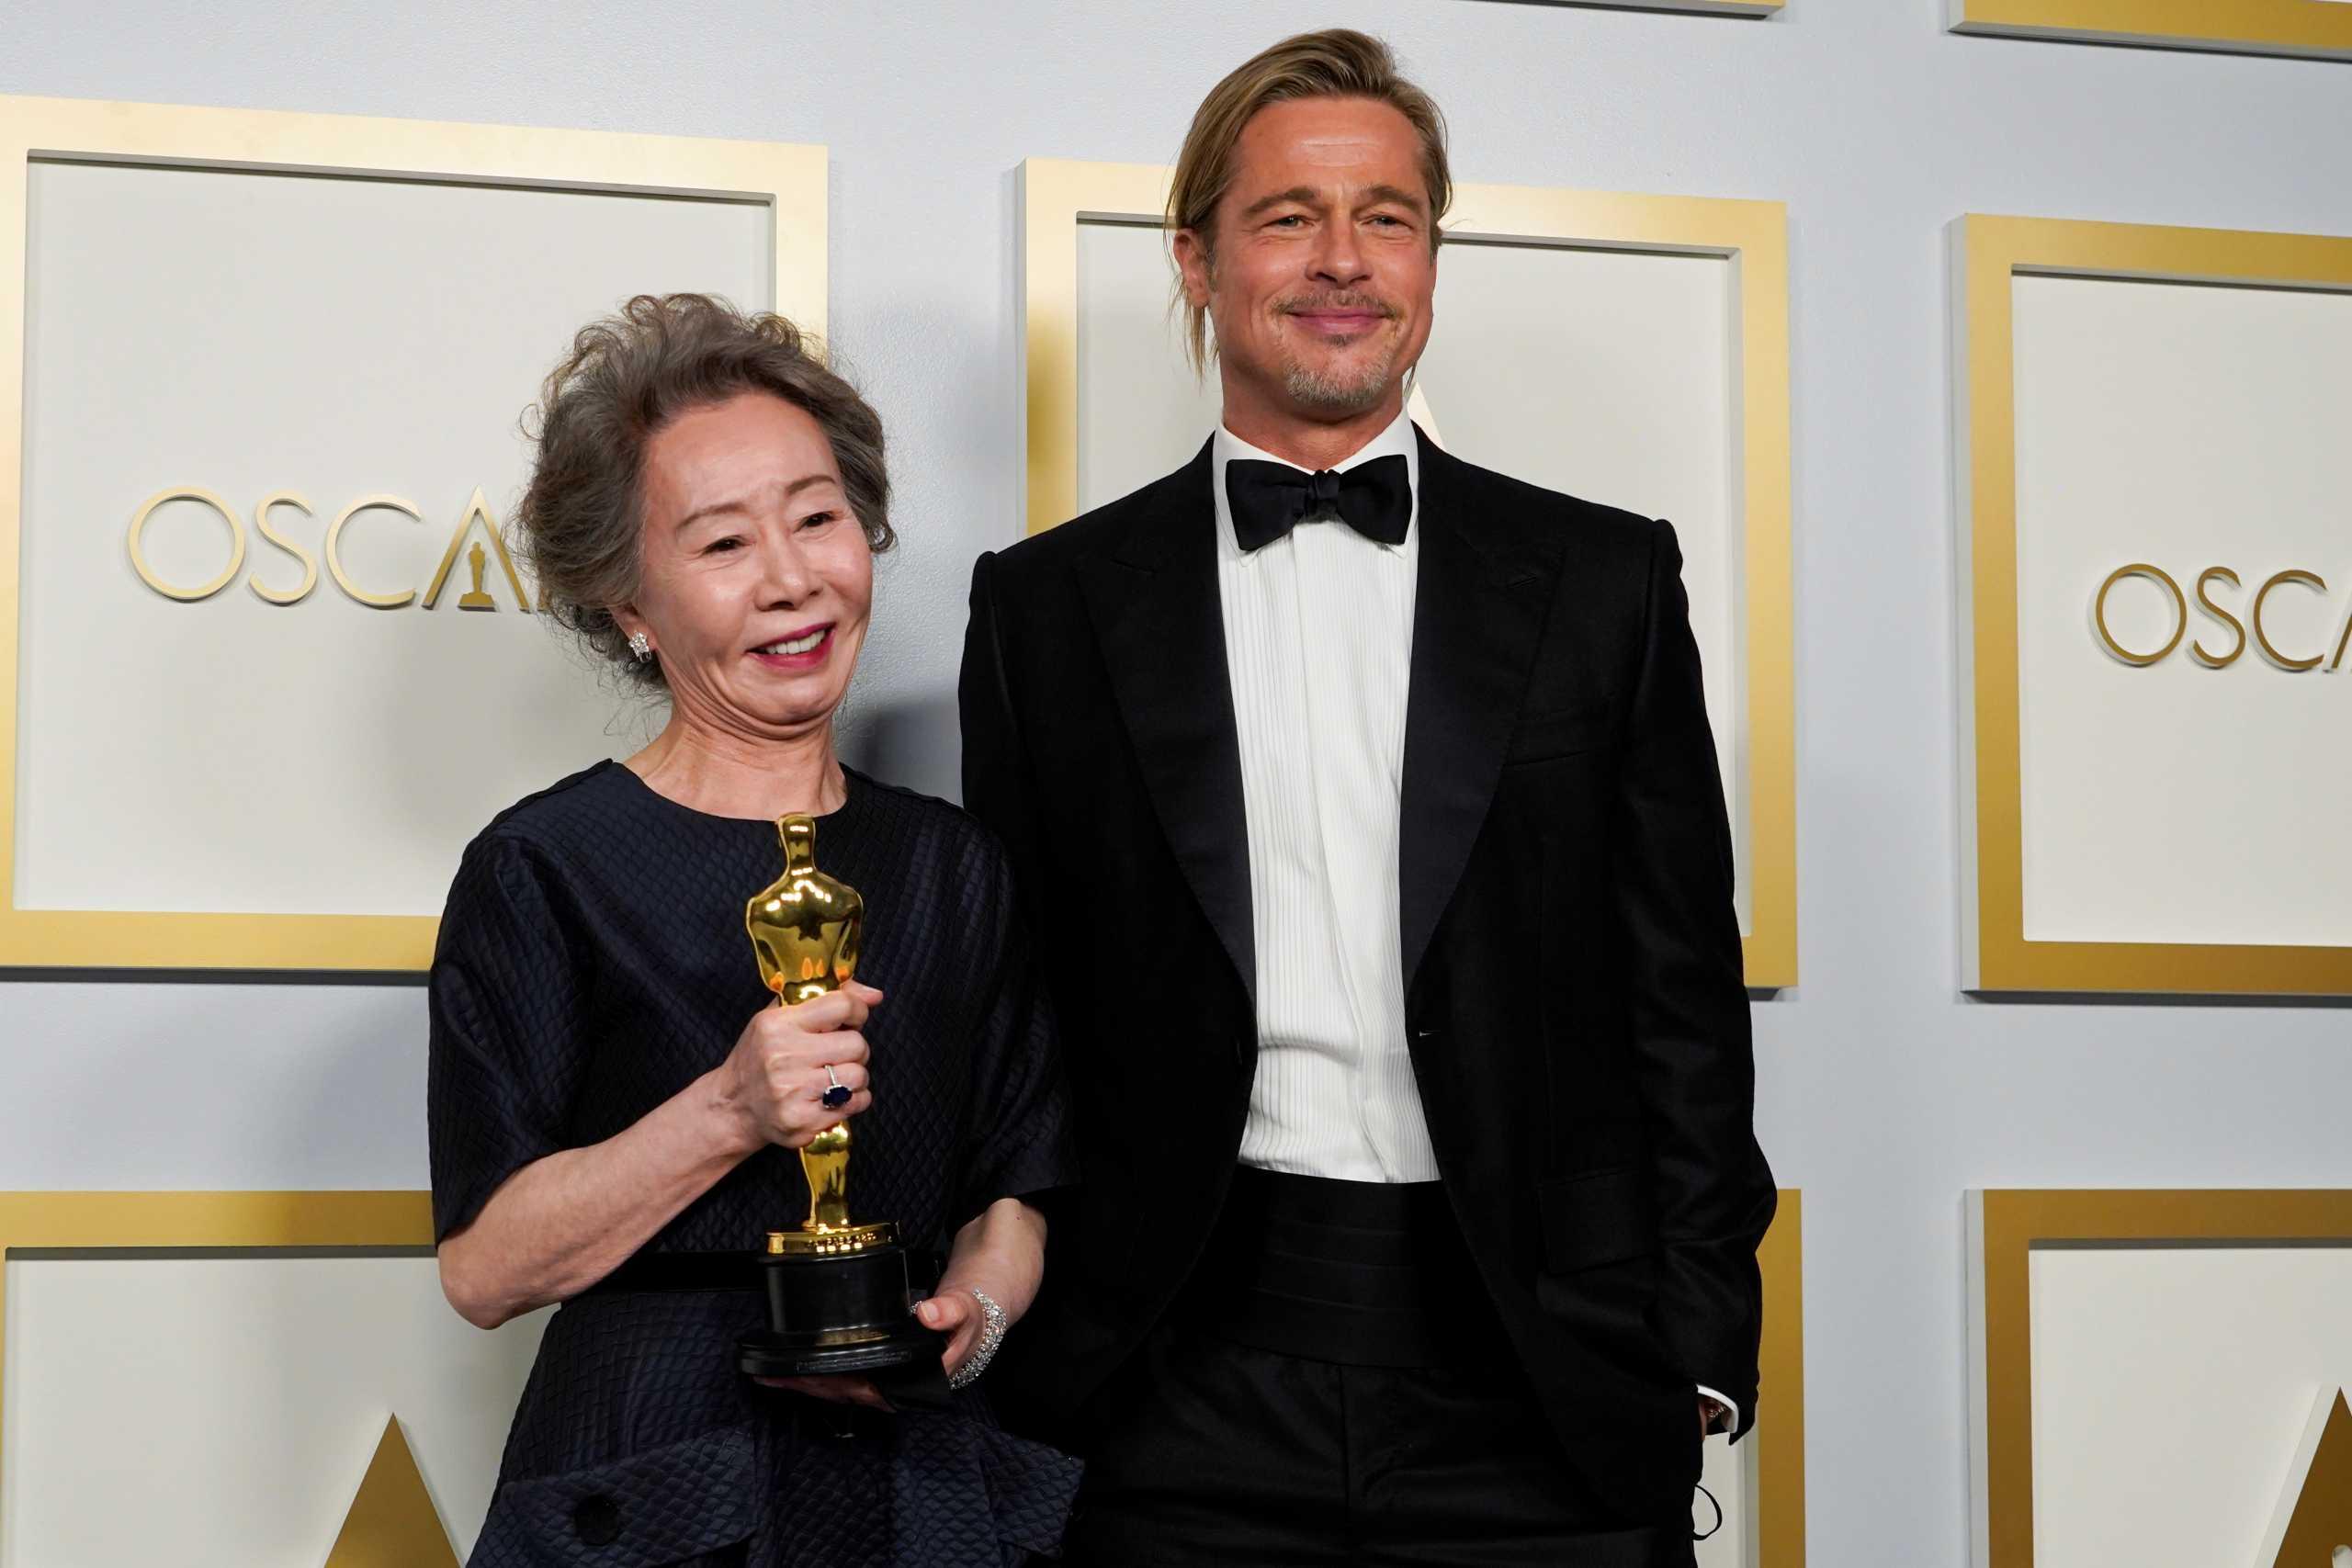 Oscar 2021: Η επική ατάκα της νικήτριας του Β Γυναικείου Ρόλου στον Μπραντ Πιτ